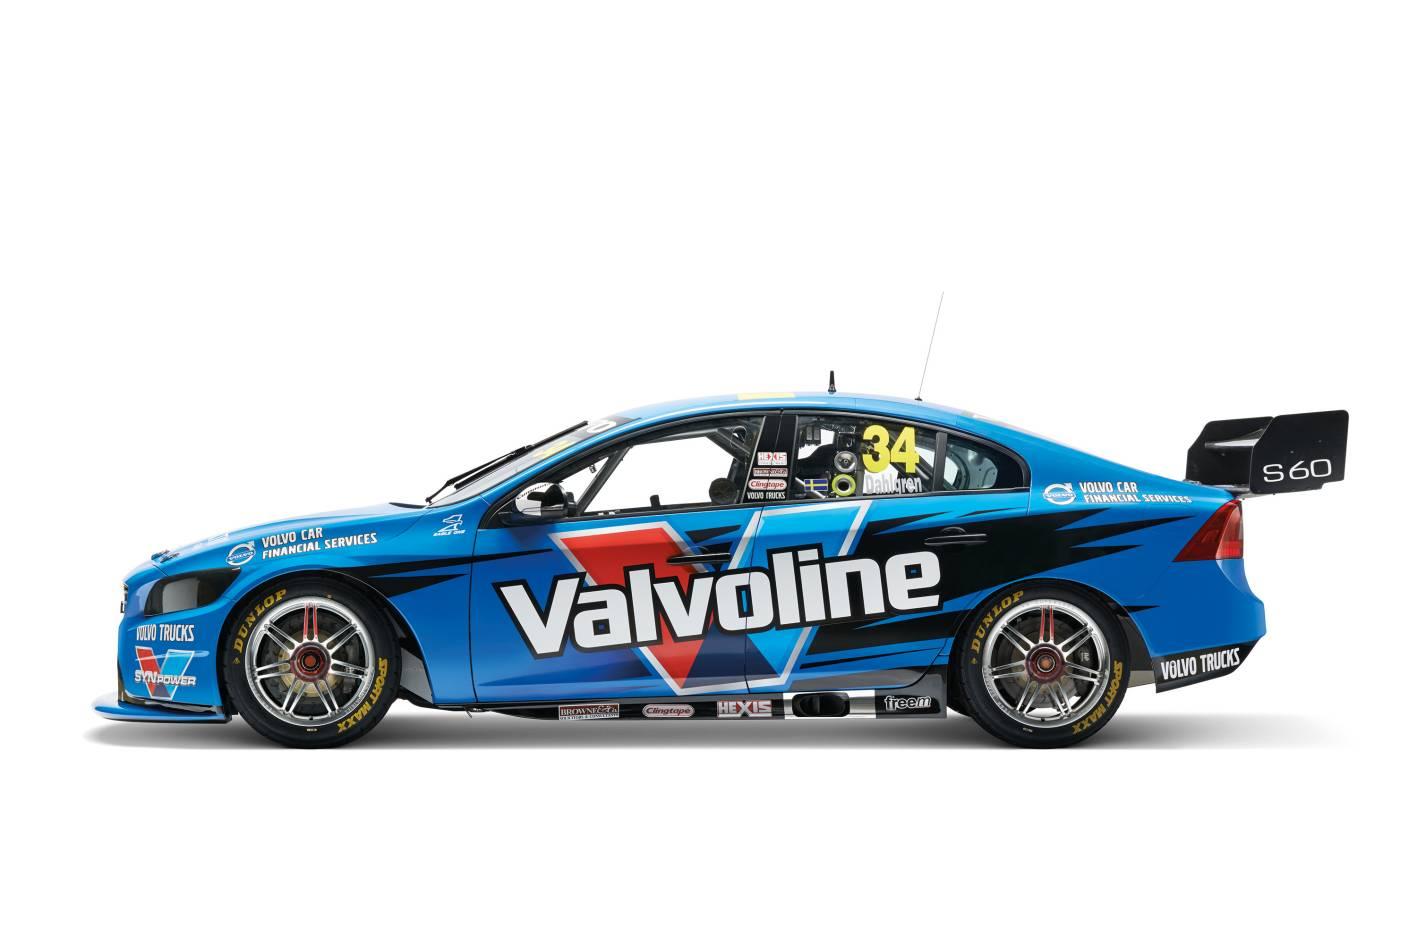 Volvo Cars News Polestar Racing S60 V8 Supercar Race Debut